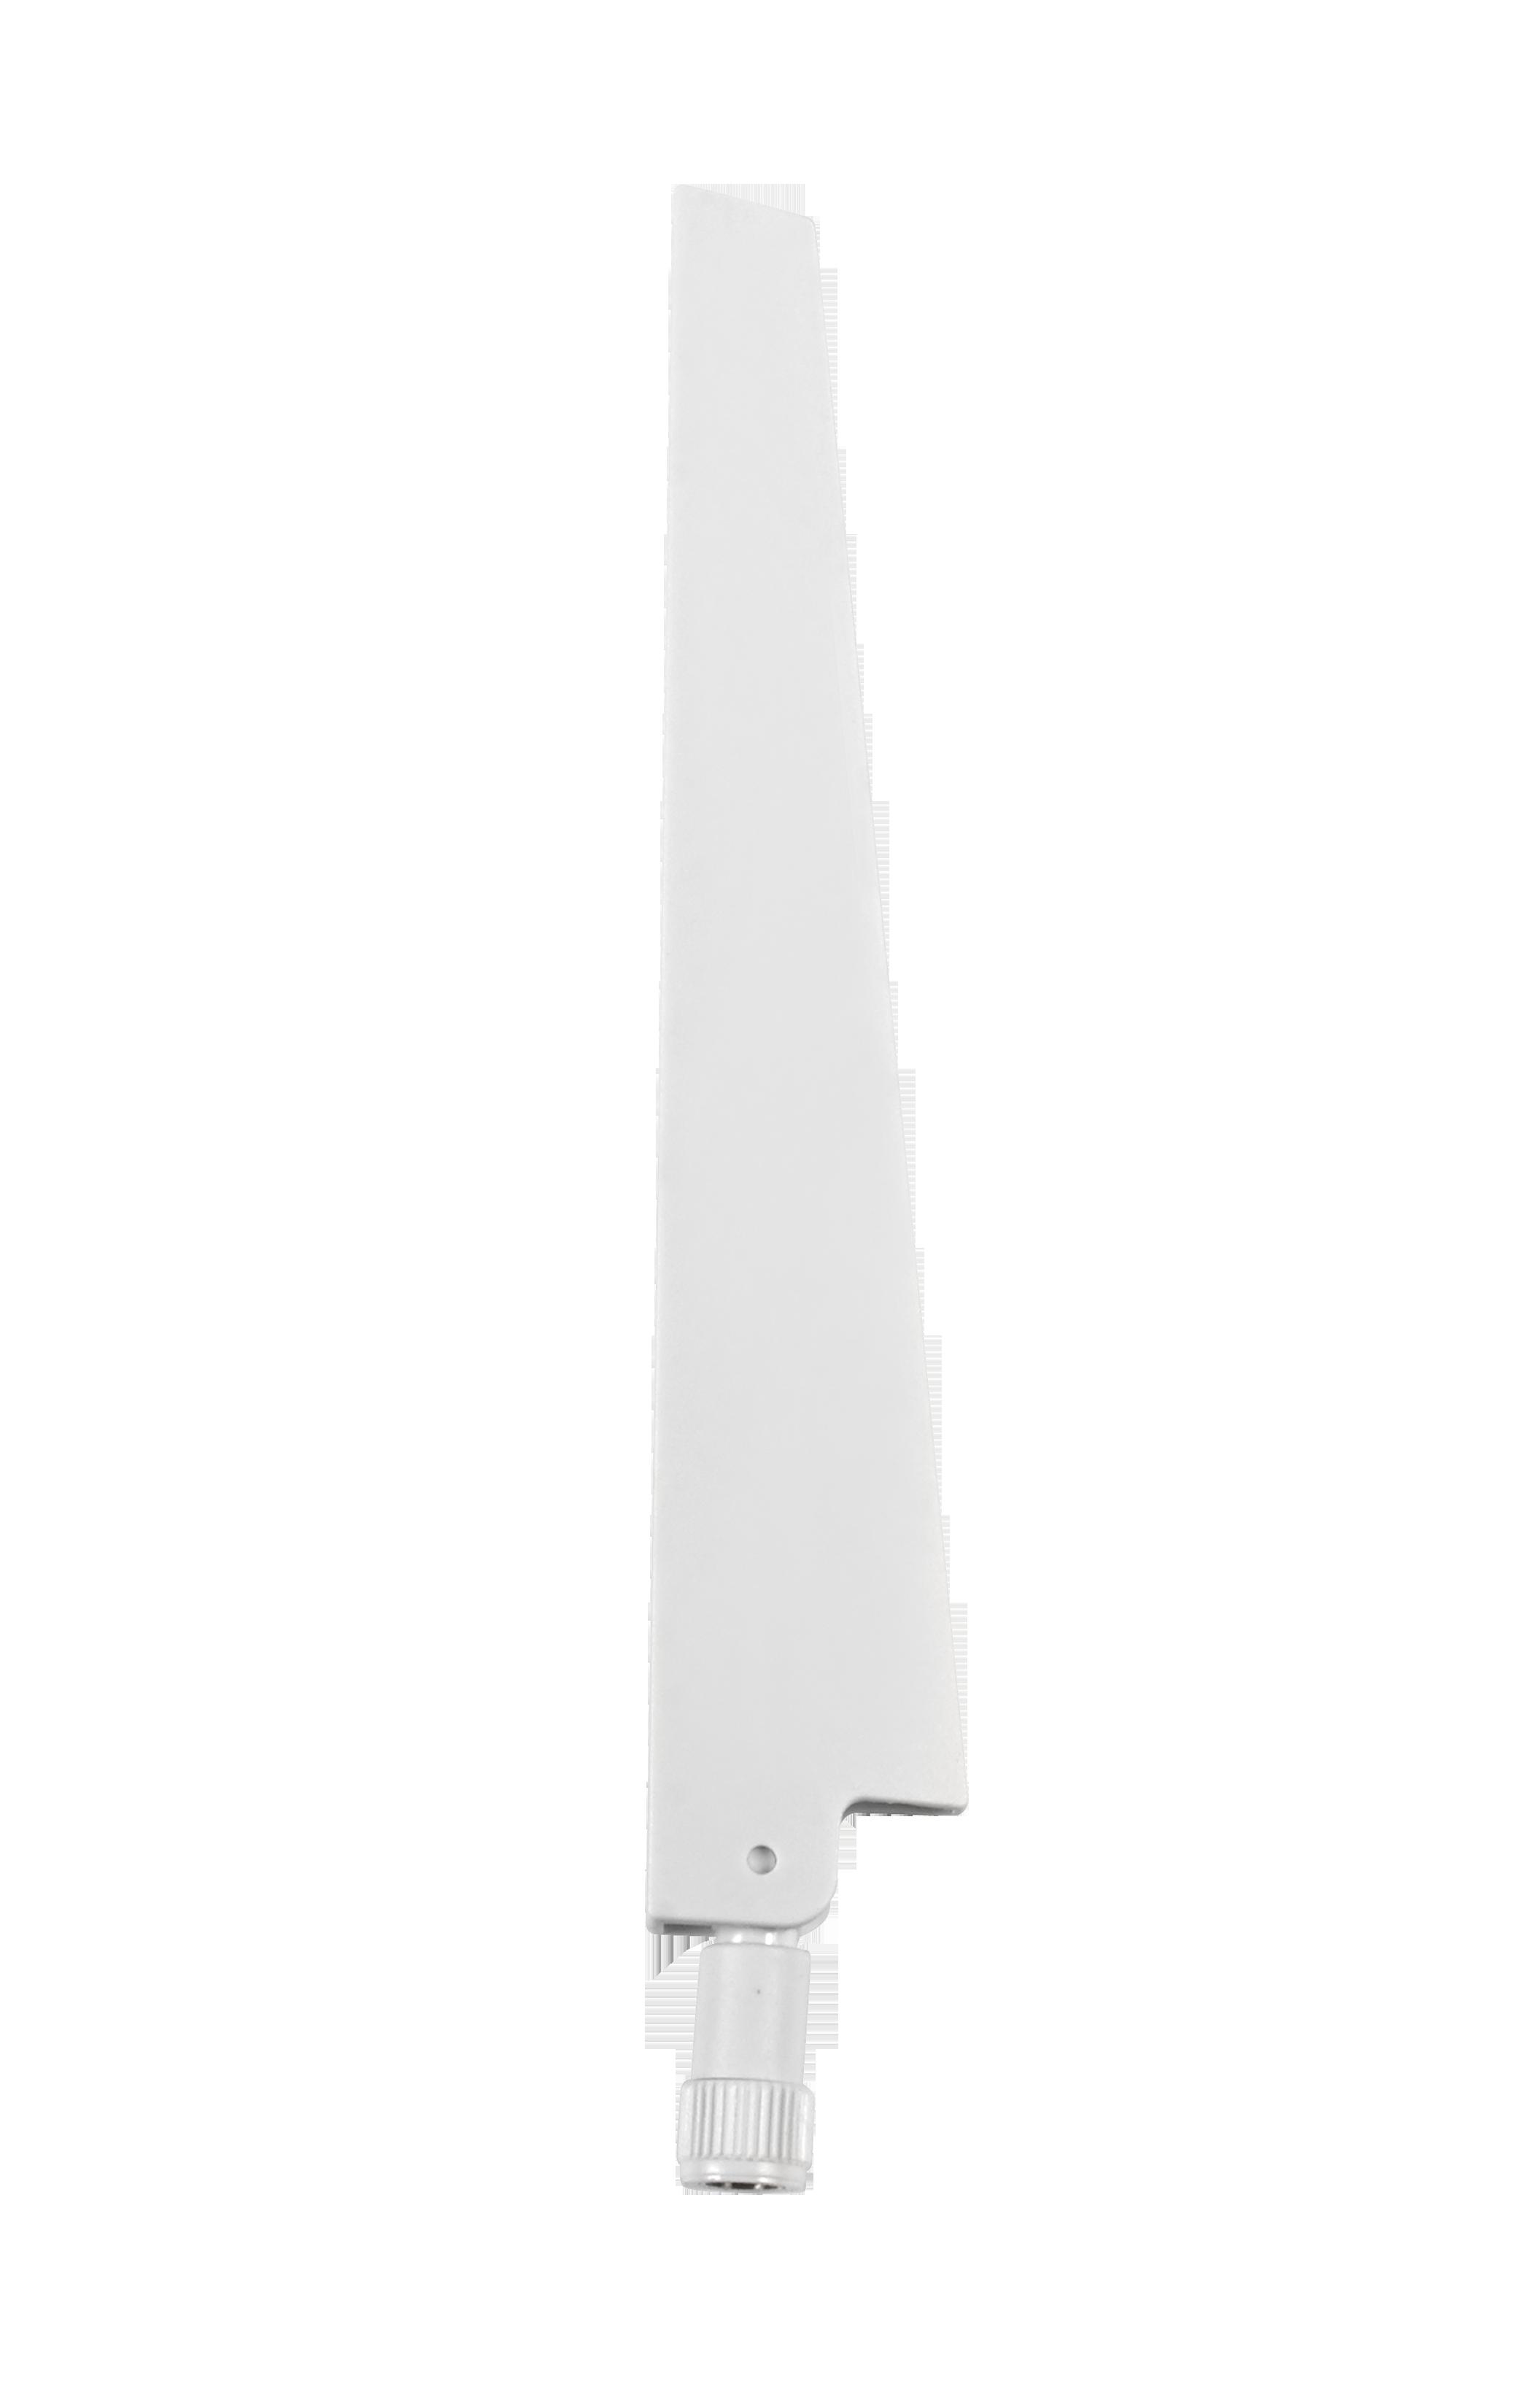 ANT2511AC | Accessories | Wireless | Business | NETGEAR